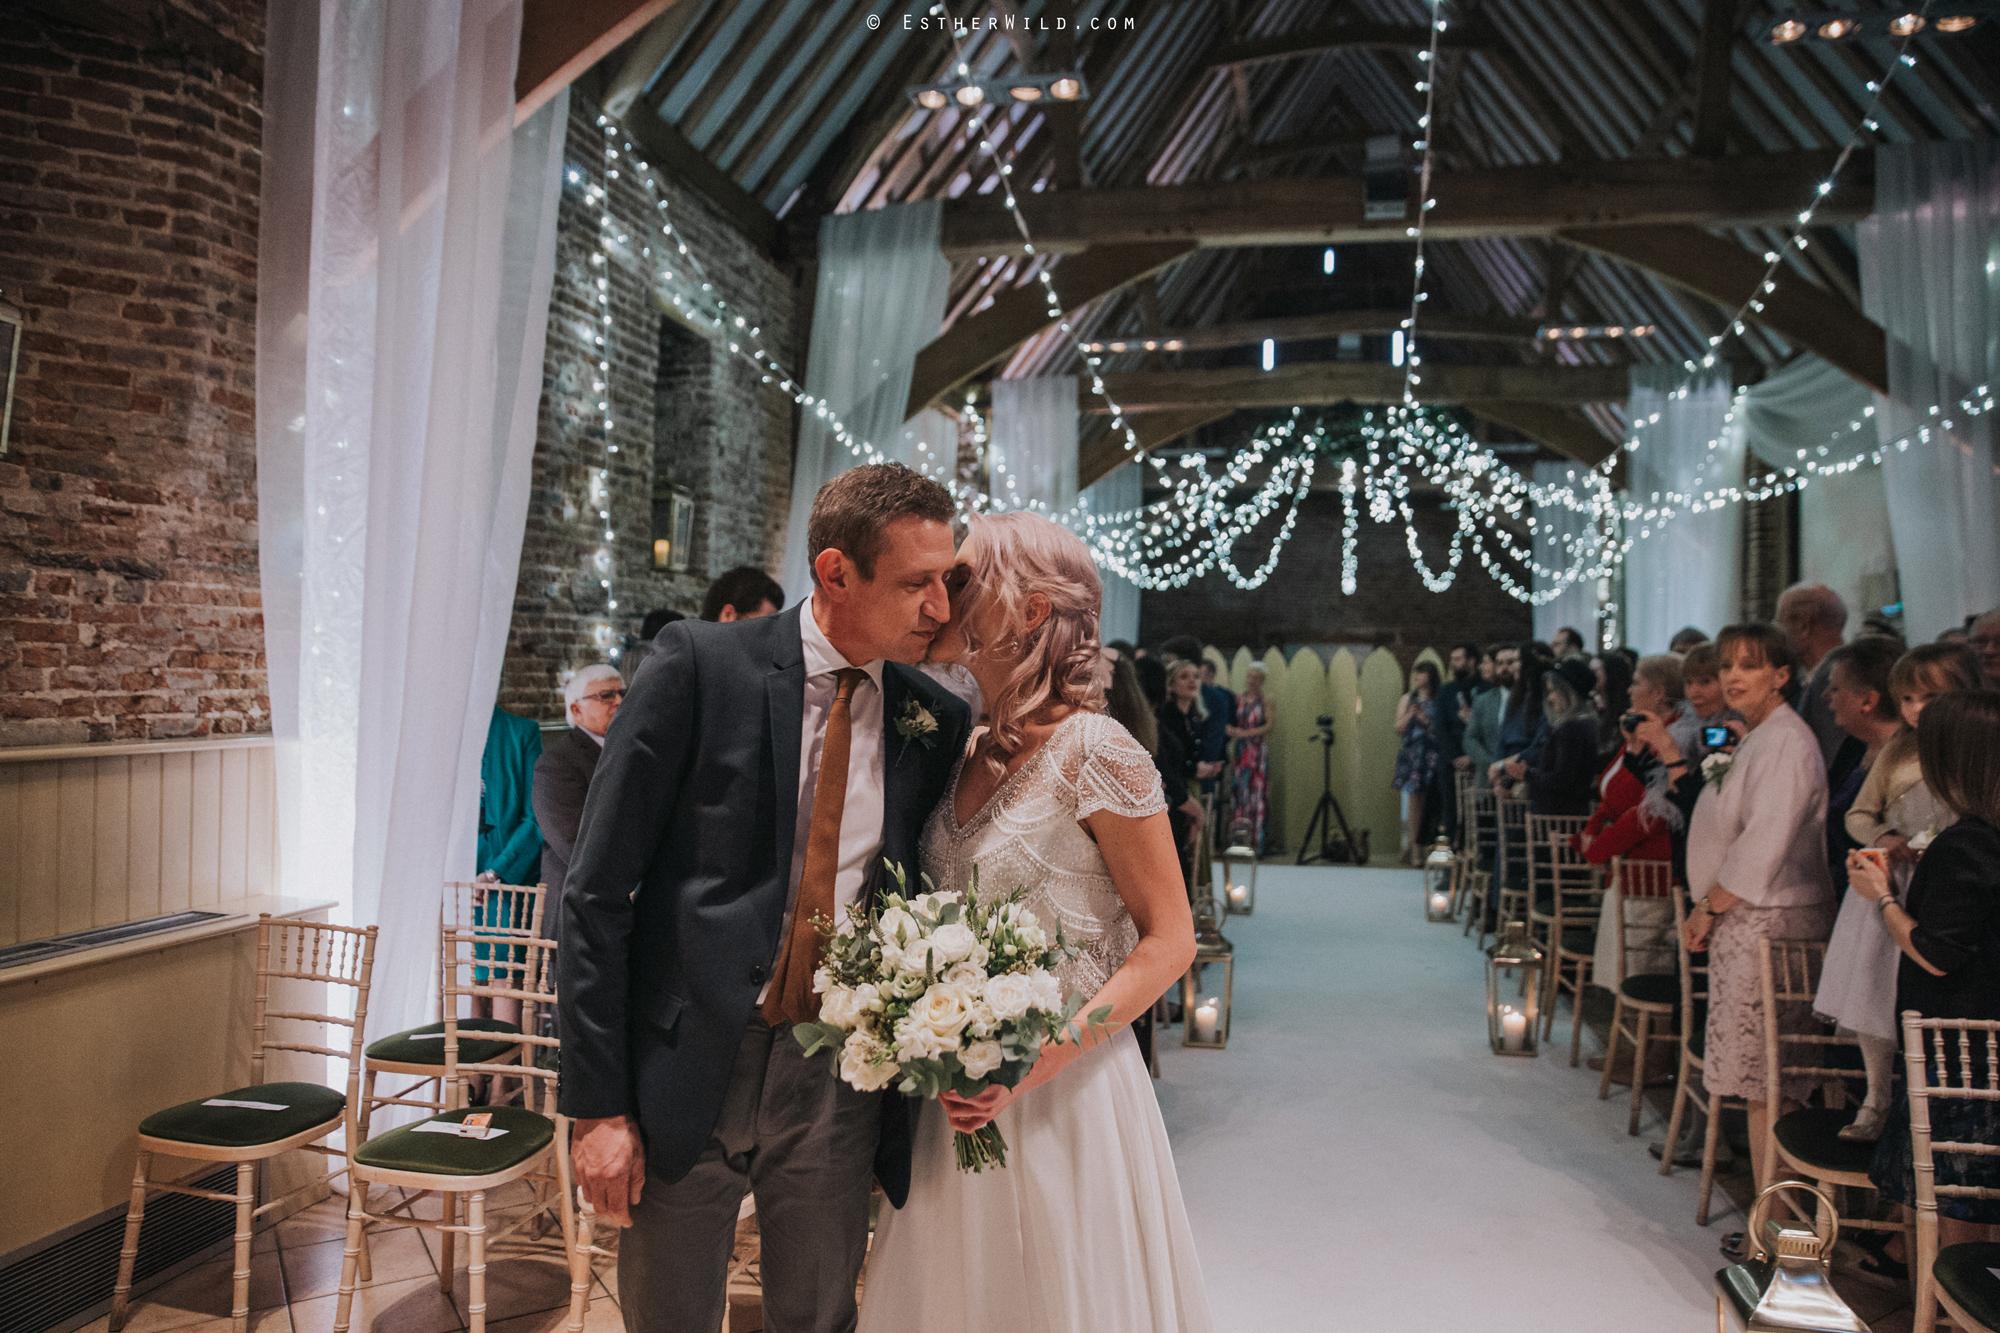 Elms_Barn_Weddings_Suffolk_Photographer_Copyright_Esther_Wild_IMG_1076.jpg